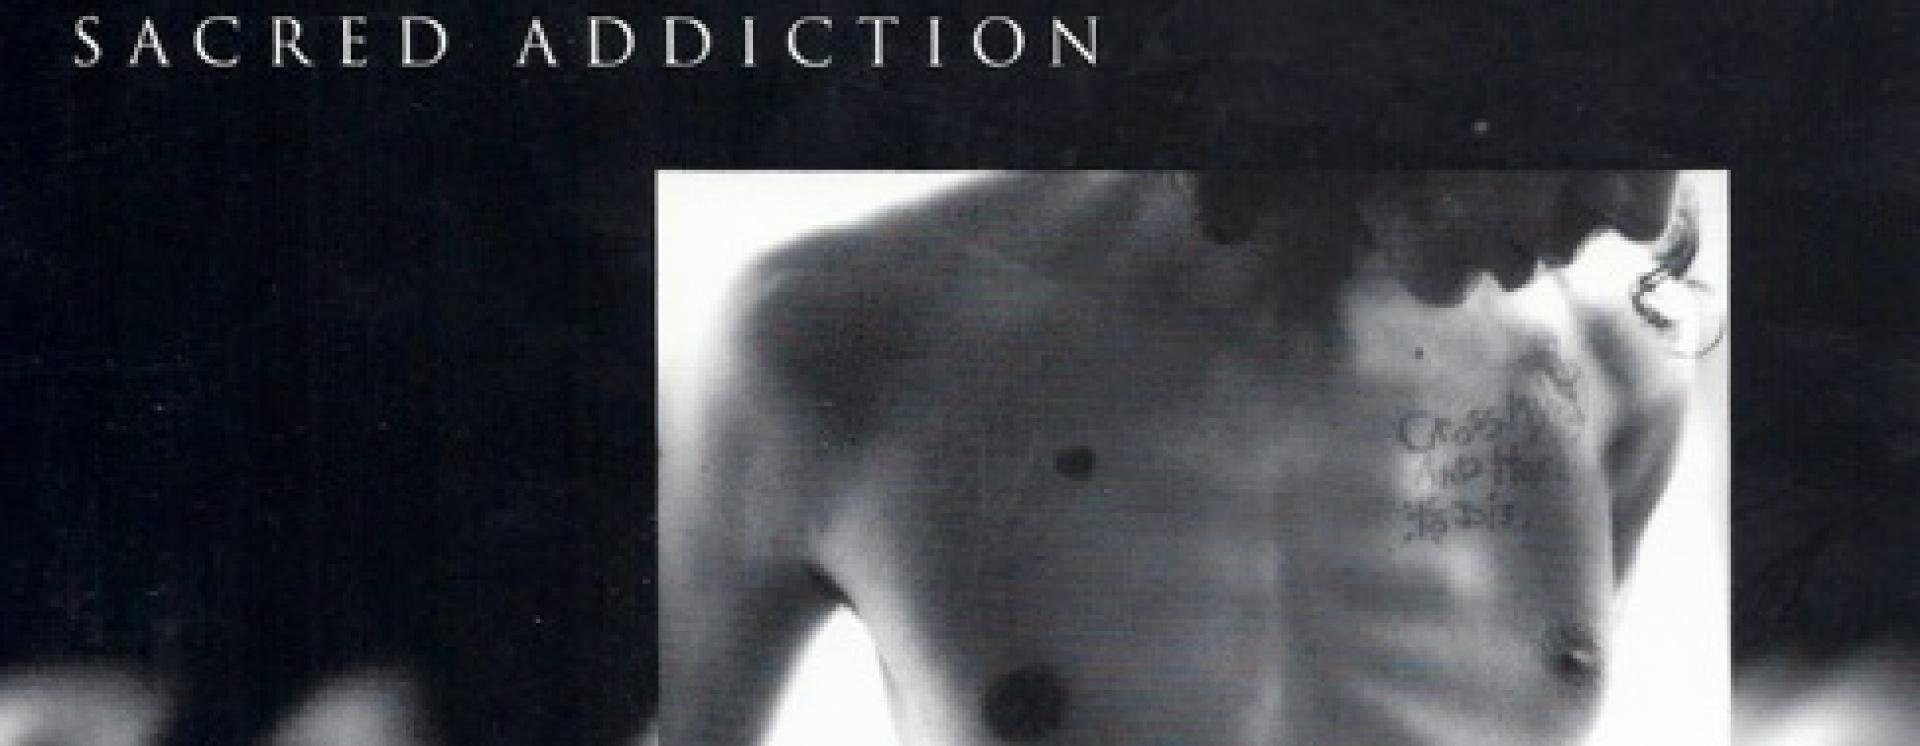 1327586858 sacred addiction single front copy